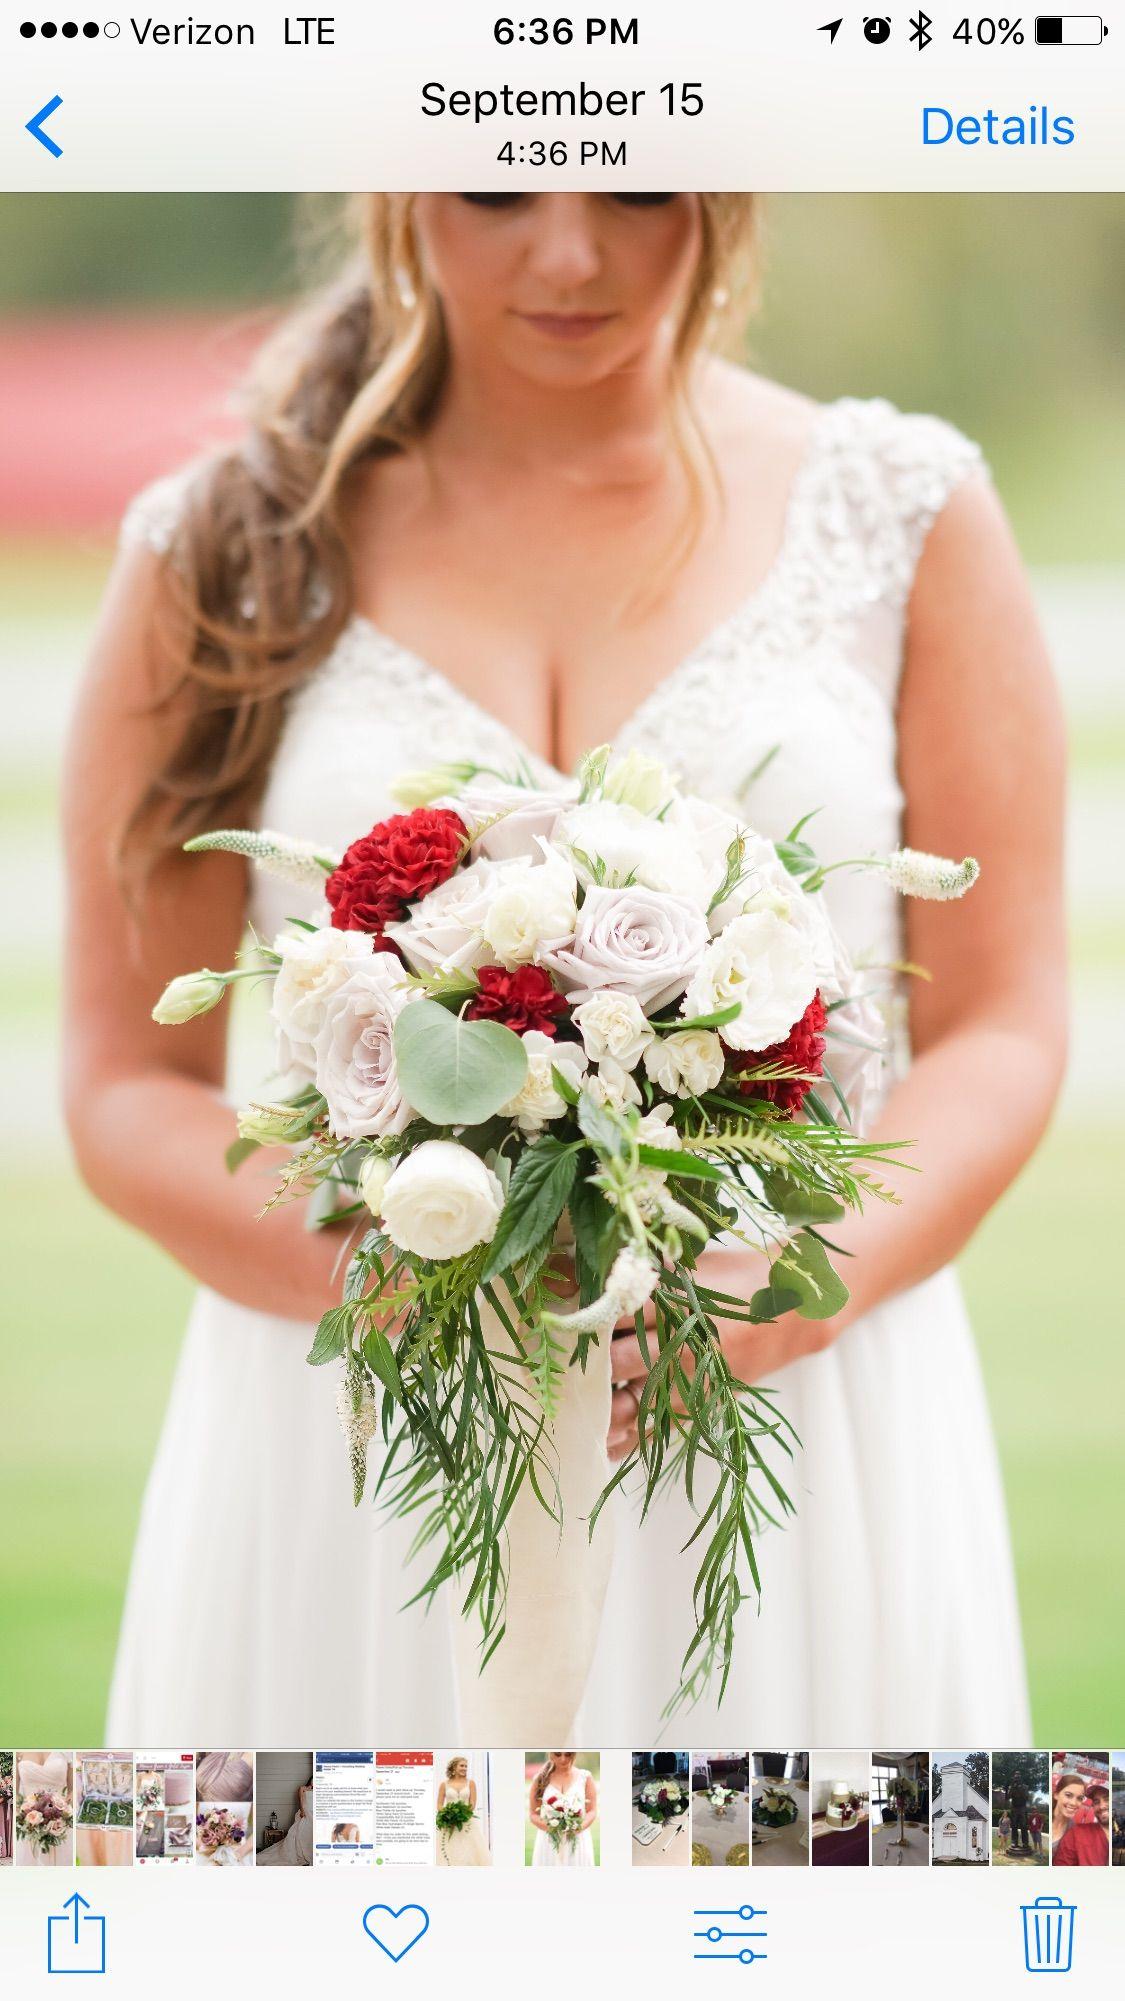 Bridal bouquet | Wedding, Bridal bouquet, Wedding bouquets